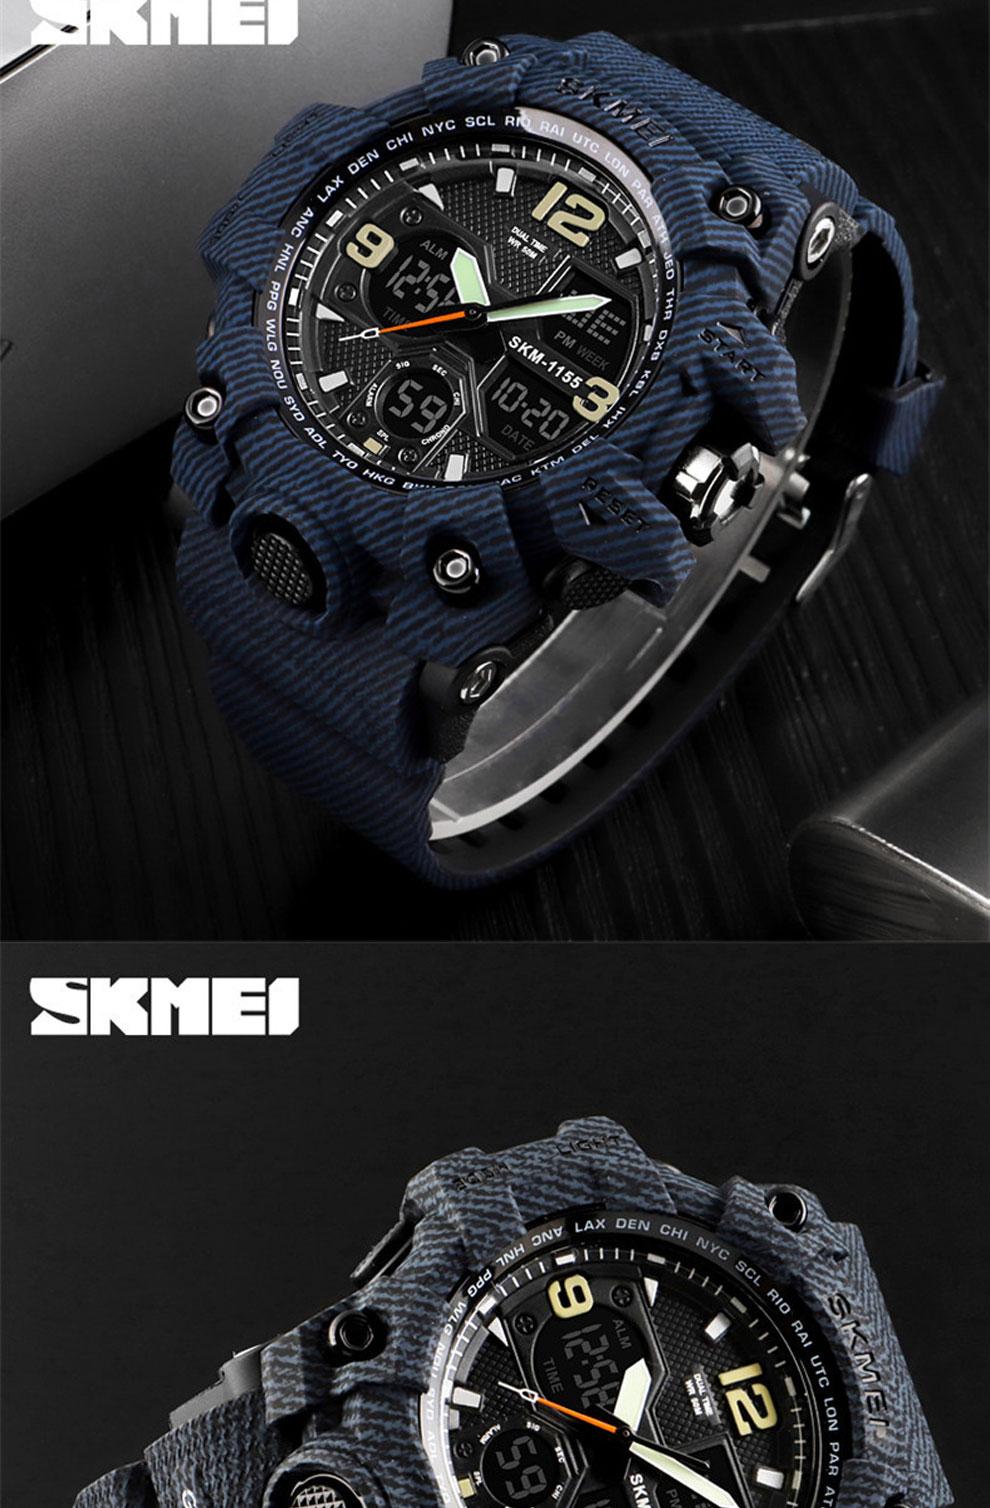 HTB1RzNuRwHqK1RjSZFEq6AGMXXaz SKMEI Brand Luxury Military Sports Watches Men Quartz Analog LED Digital Clock Man Waterproof Dual Display Wristwatches Relogio